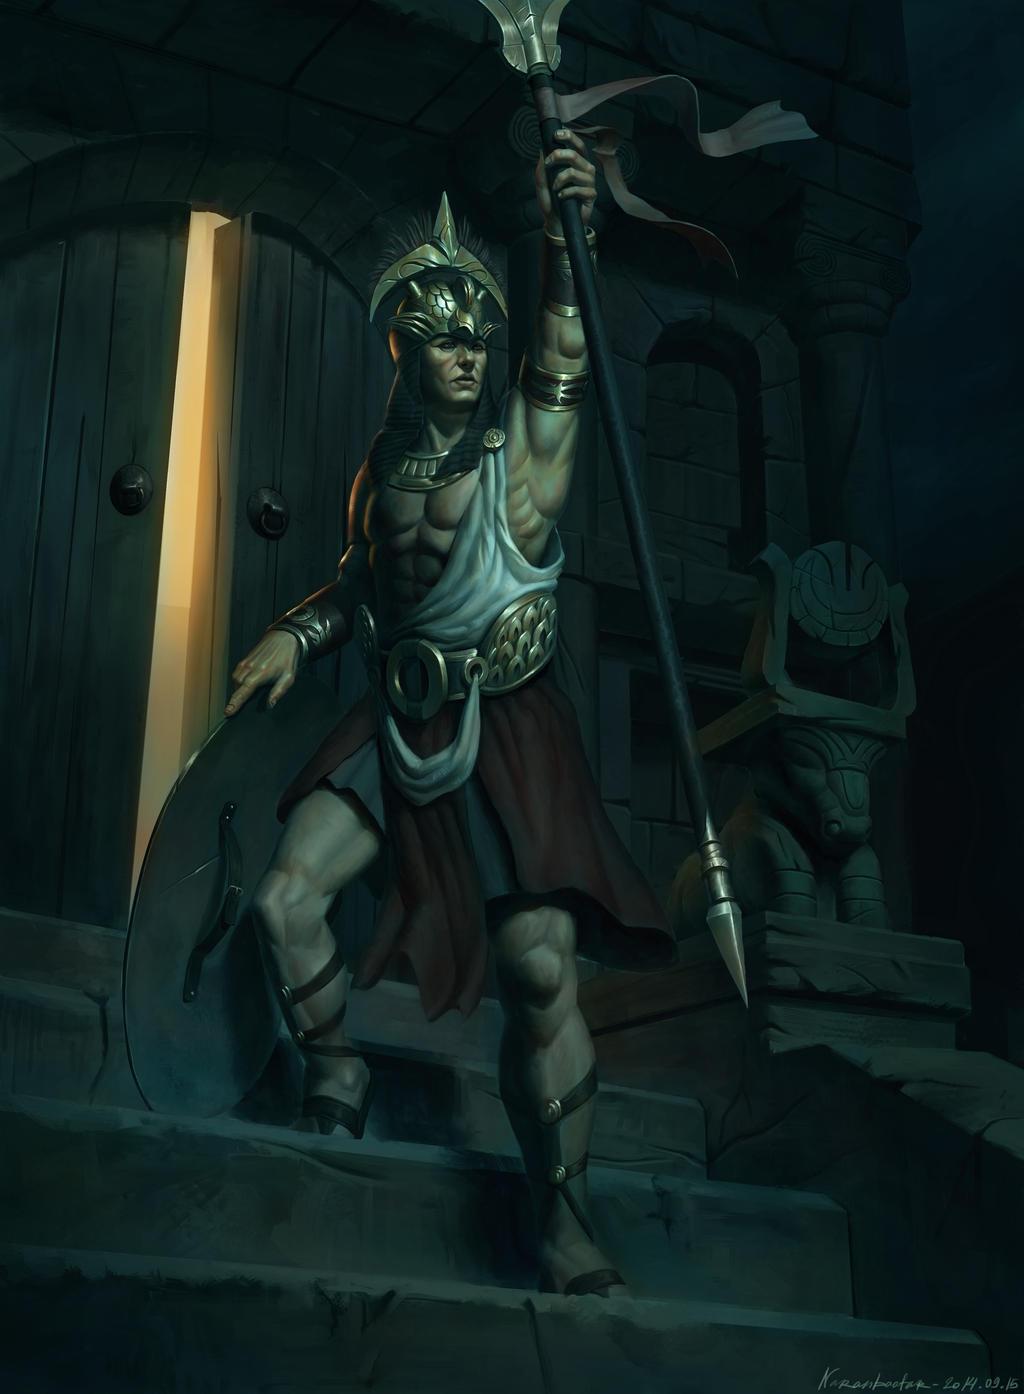 Atlantean champion by Naranb on DeviantArt